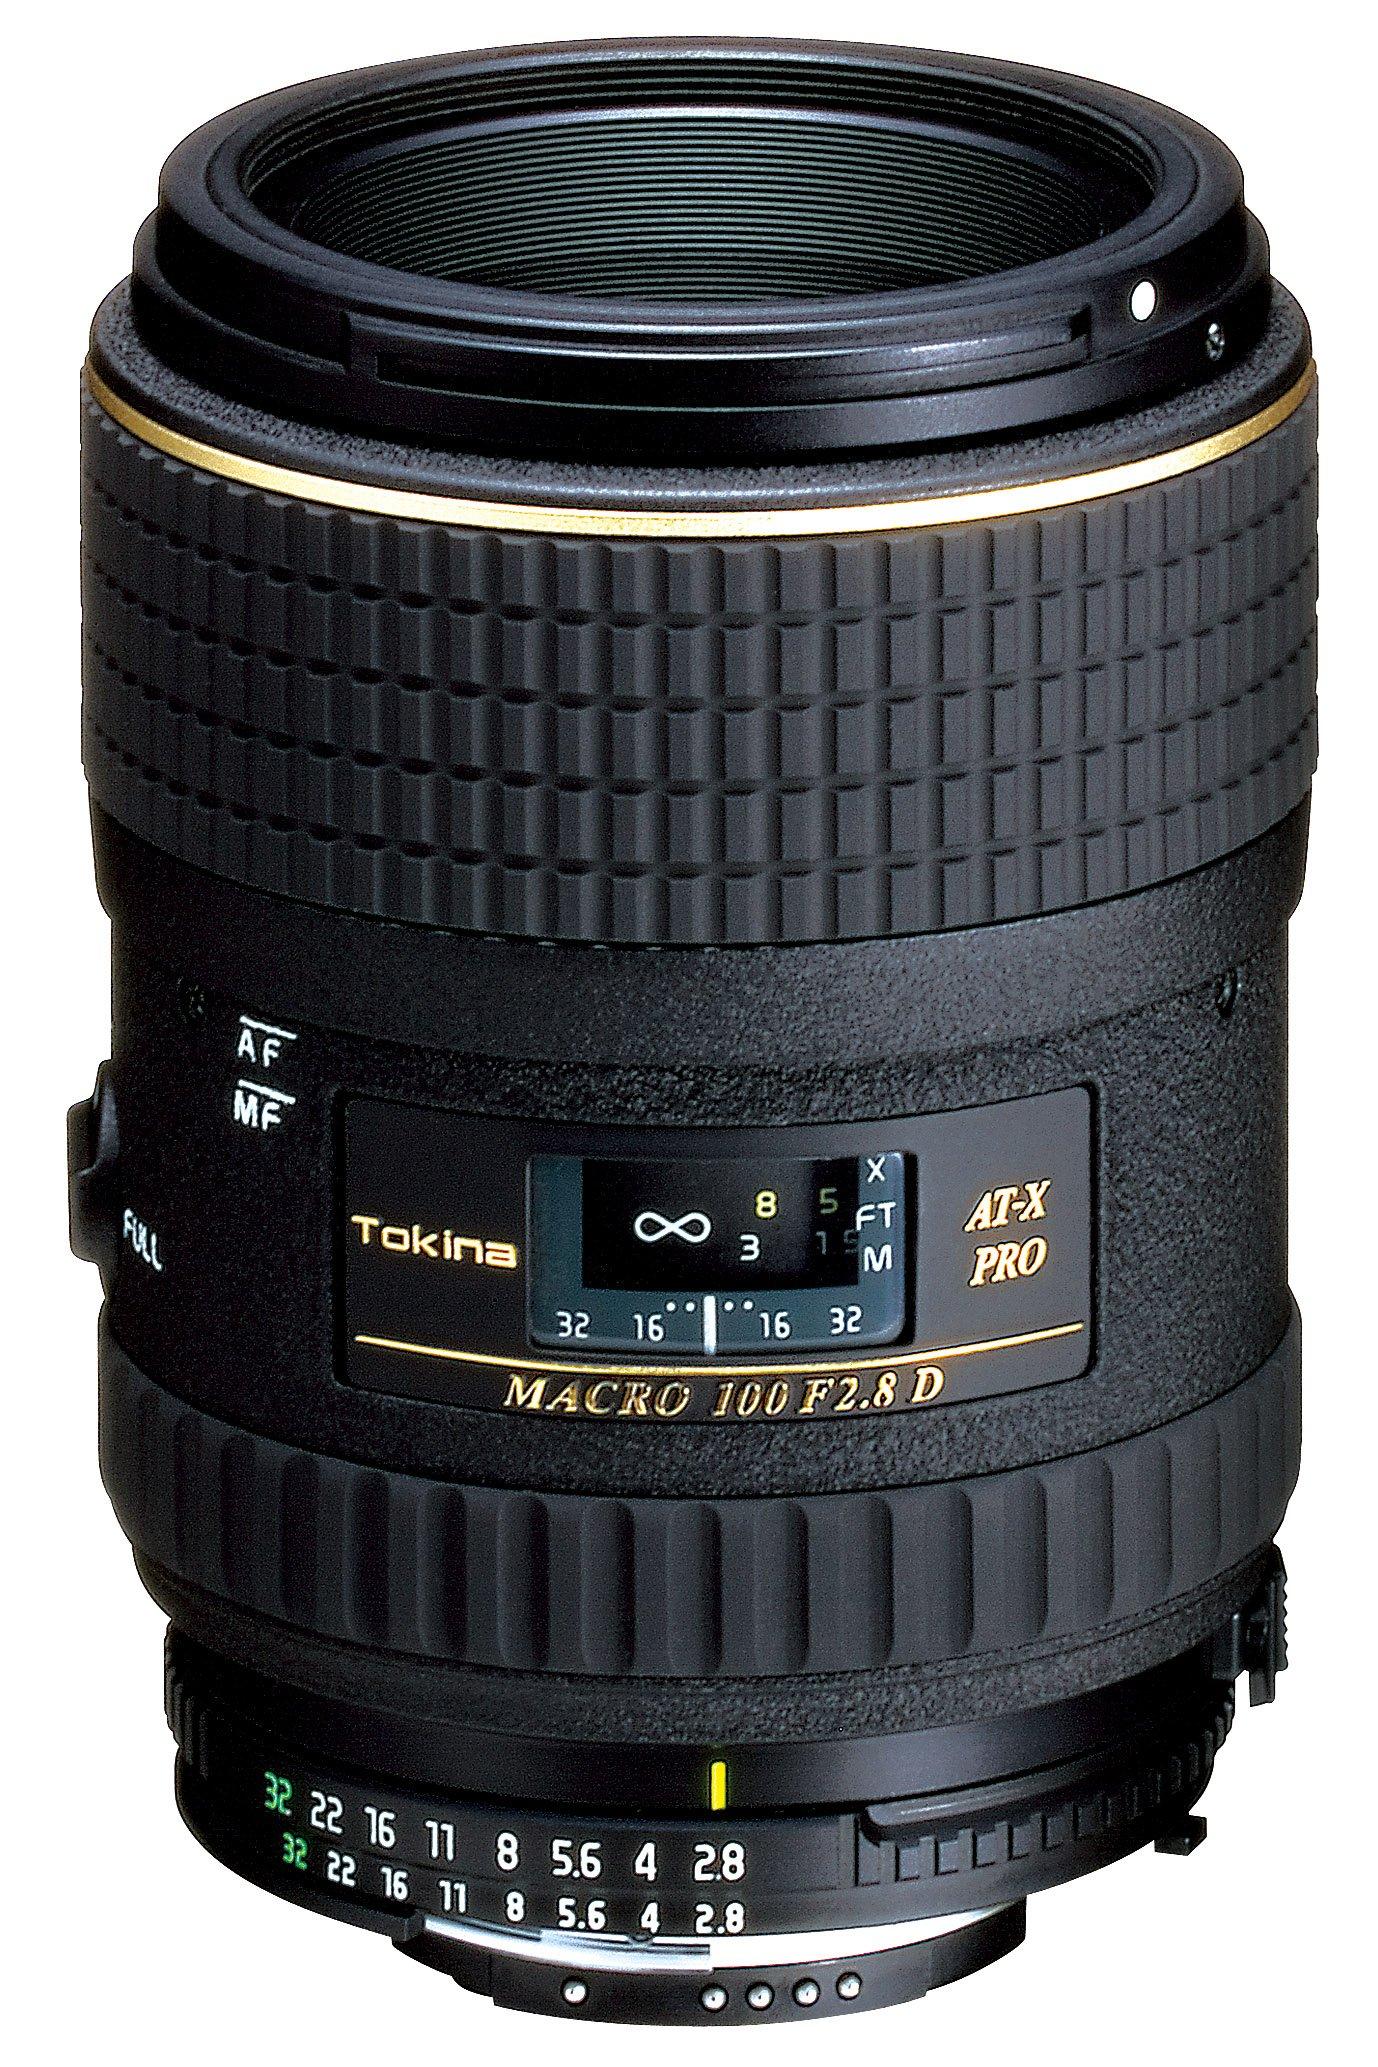 Tokina at-X PRO M 100mm F2.8 D Macro Lens - Nikon AF Mount